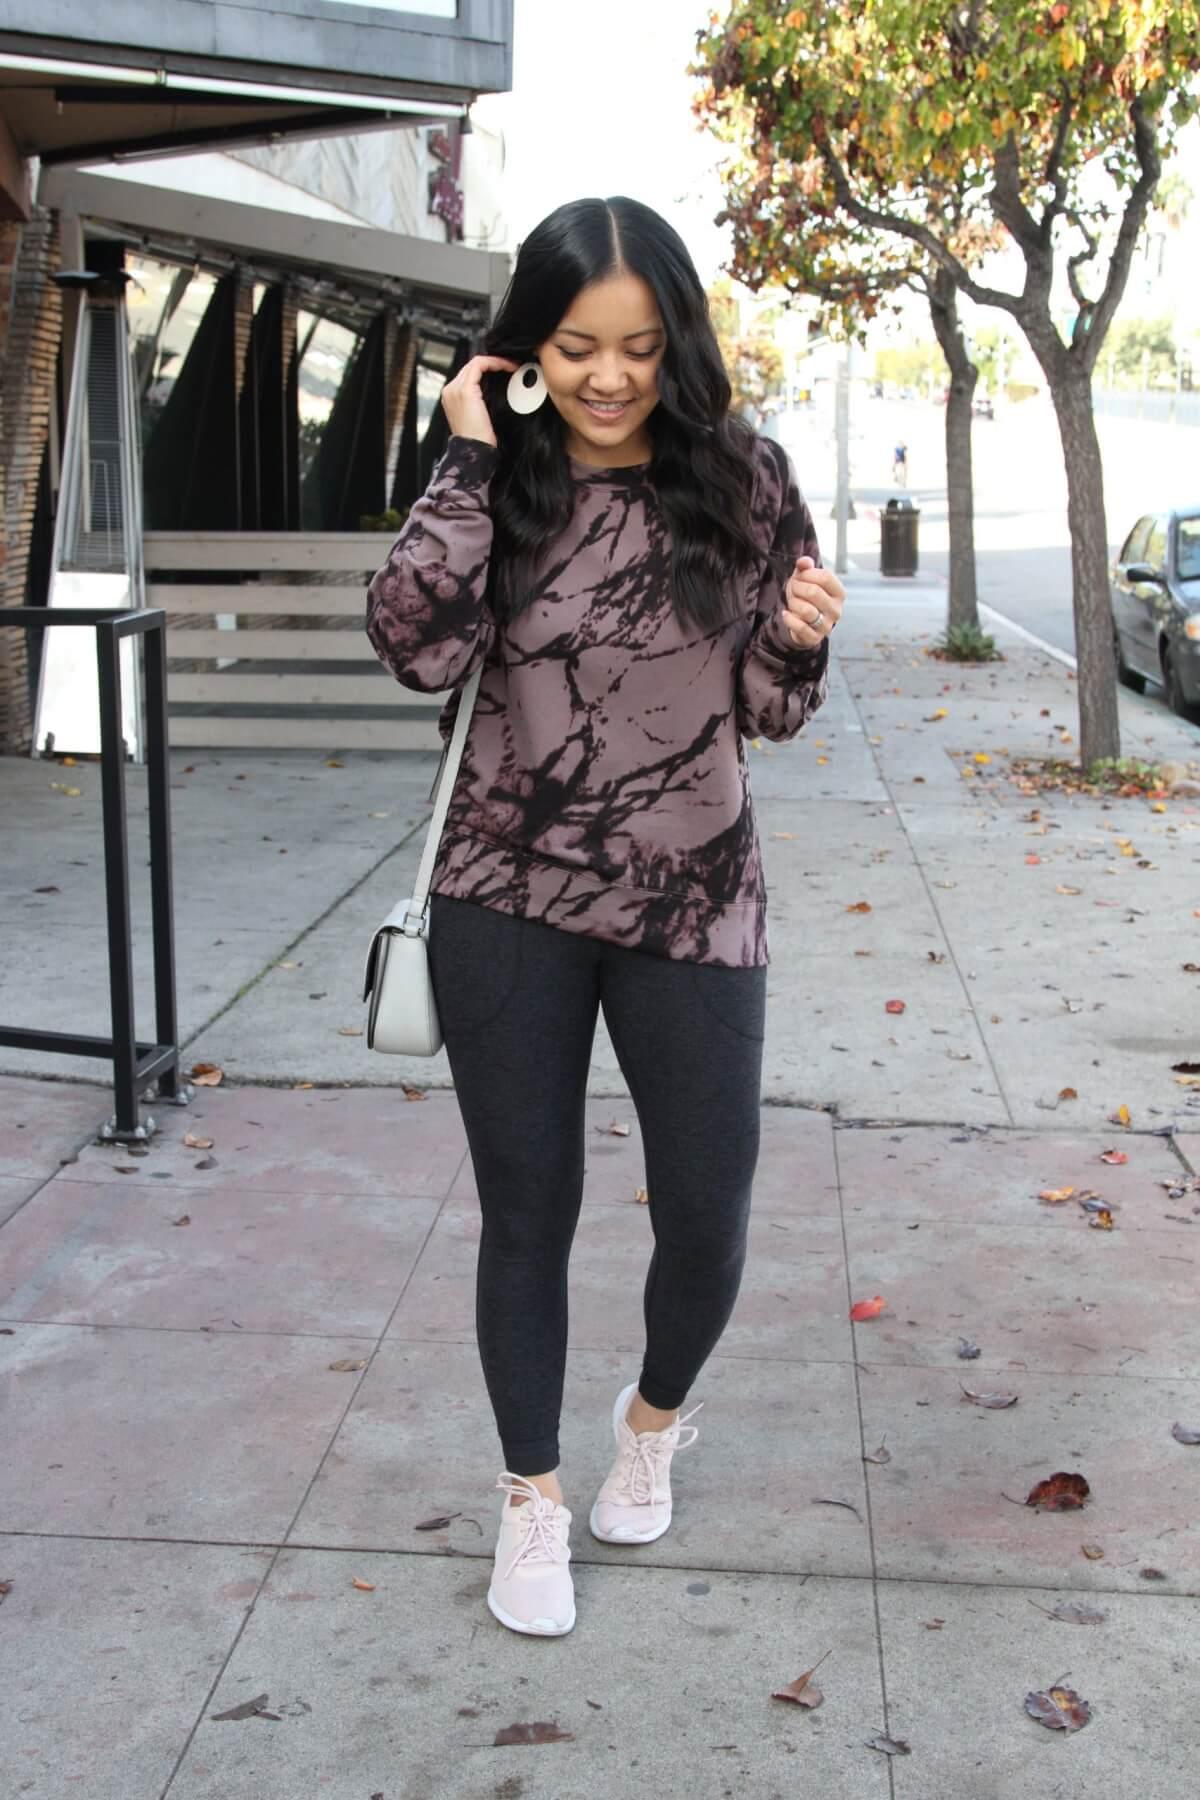 Winter Athleisure Outfit: purple and black splattered sweatshirt + dark grey pocket leggings + blush sneakers + grey crossbody bag + cream leather earrings